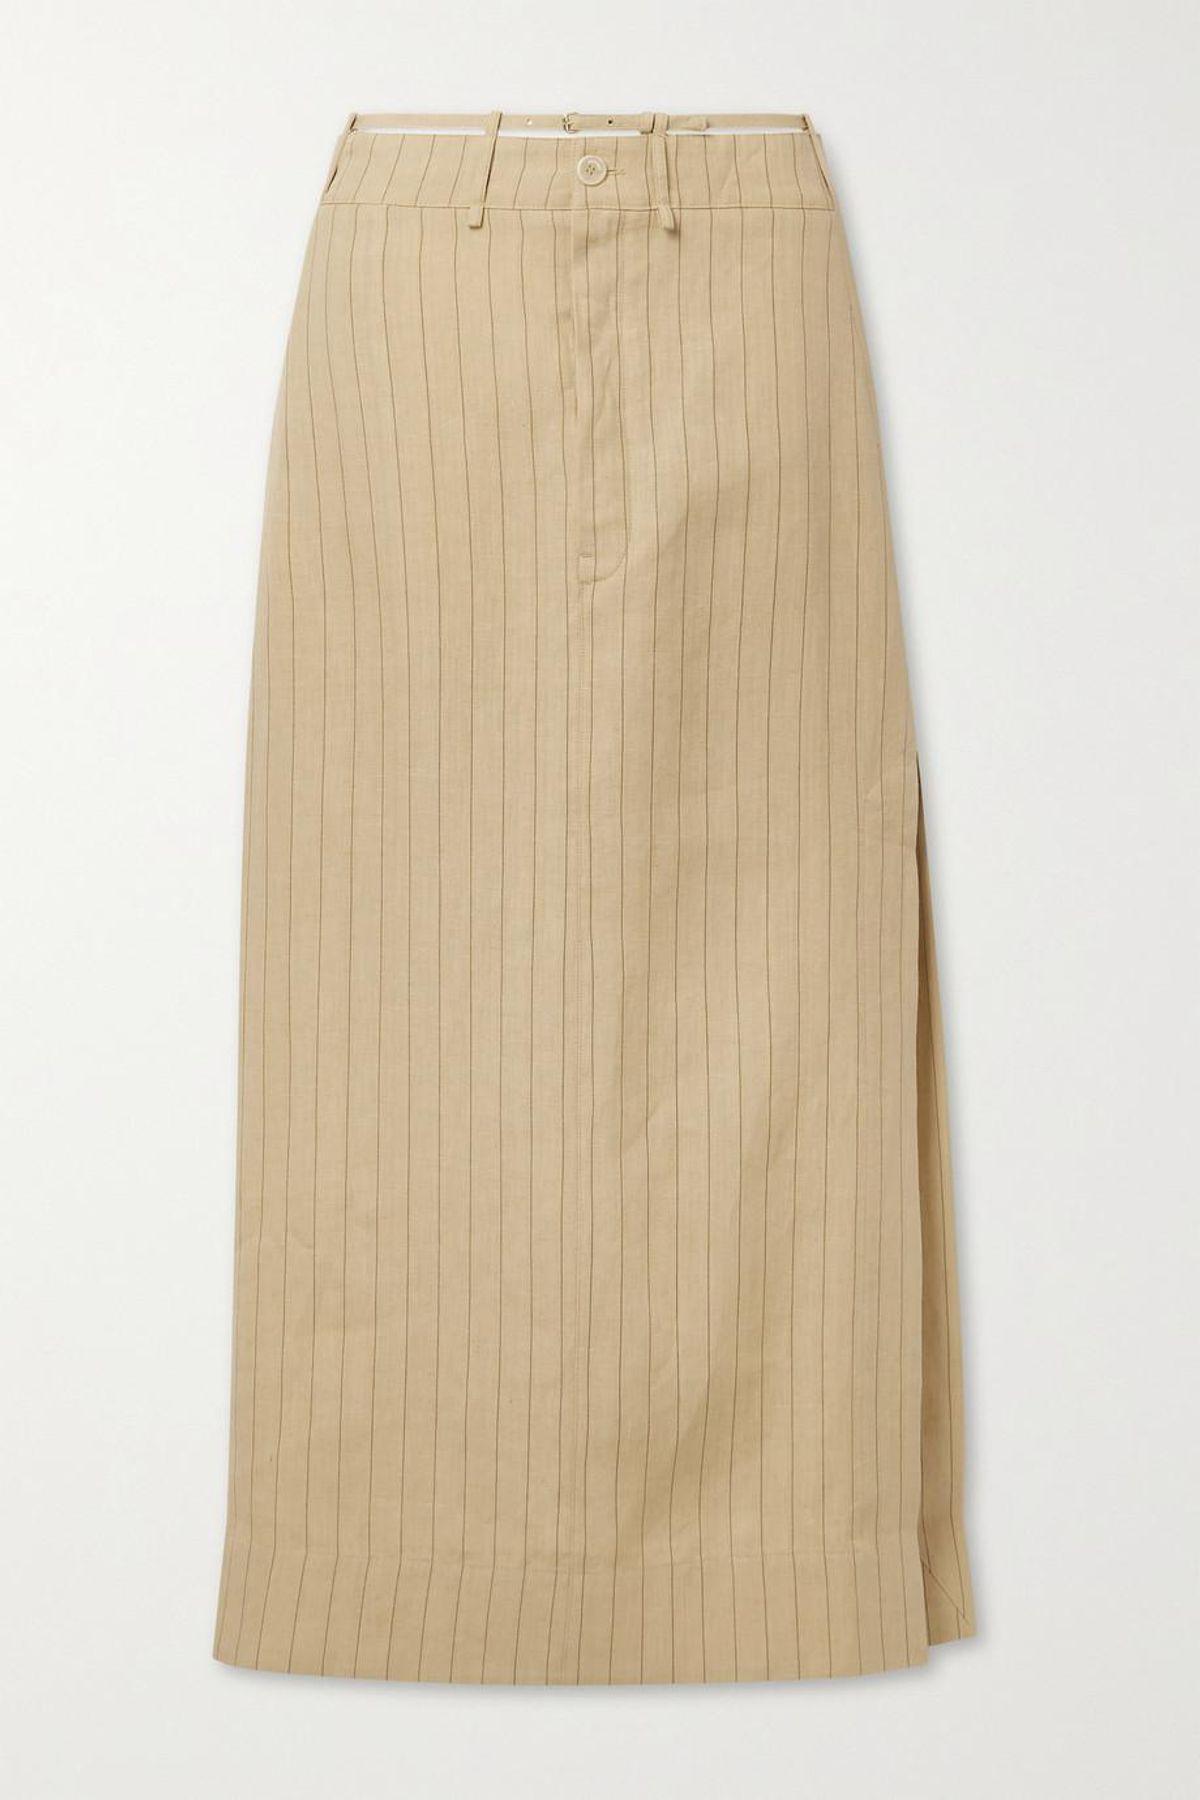 Terraio Cutout Pinstriped Linen Maxi Skirt